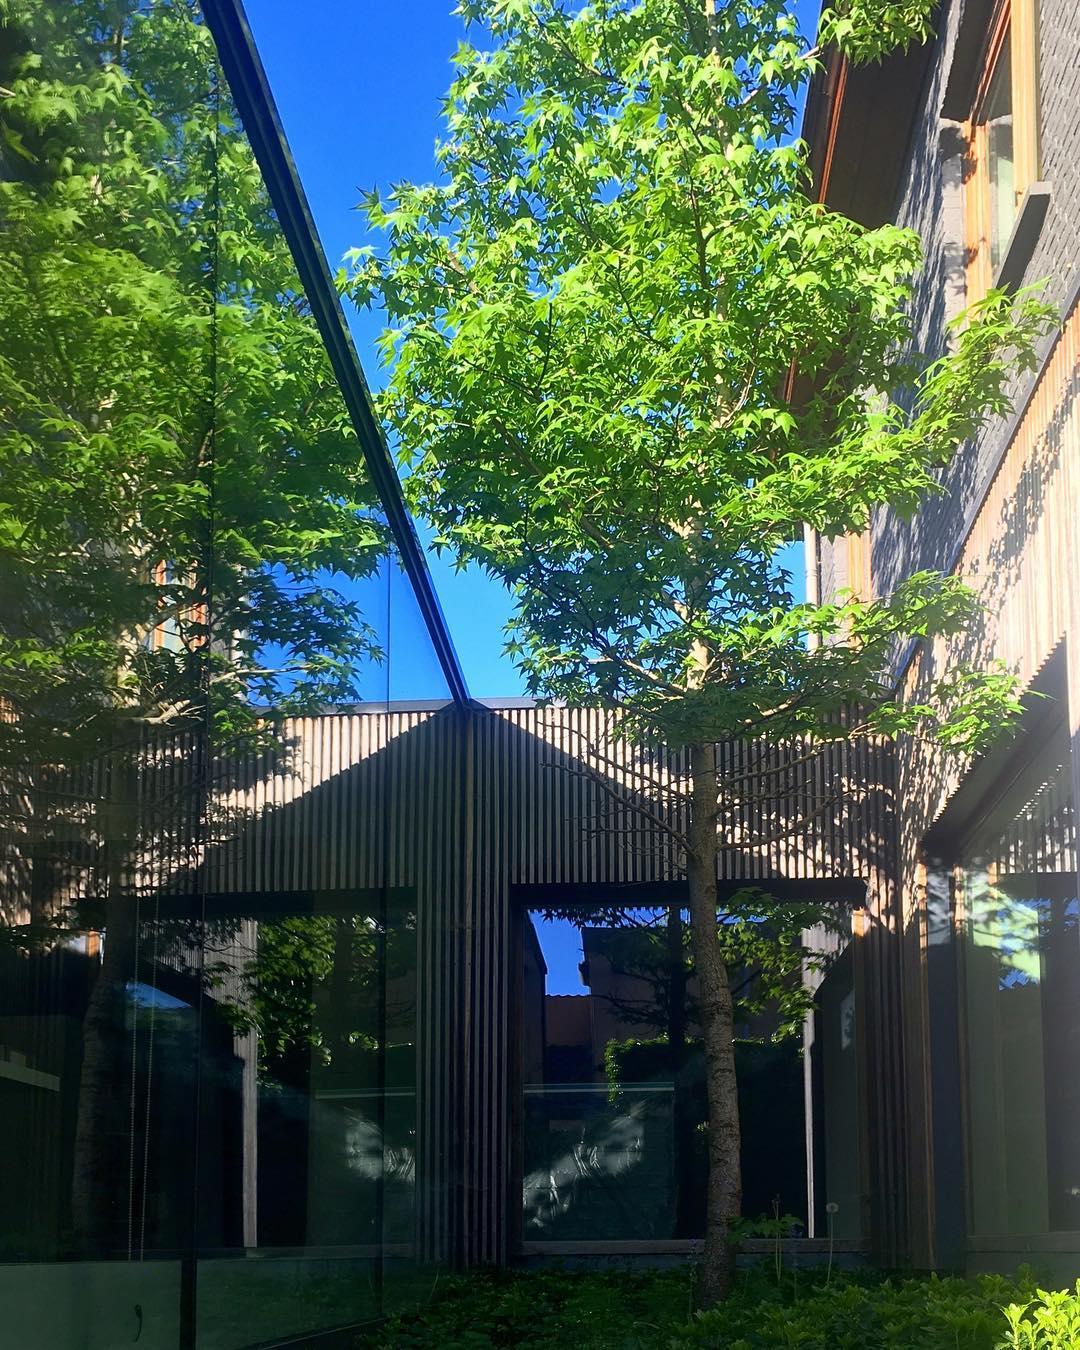 2018 05 07 Bid1NKWDGGr 1773807829179457963 | Baeyens & Beck architecten Gent | architect nieuwbouw renovatie interieur | high end | architectenbureau